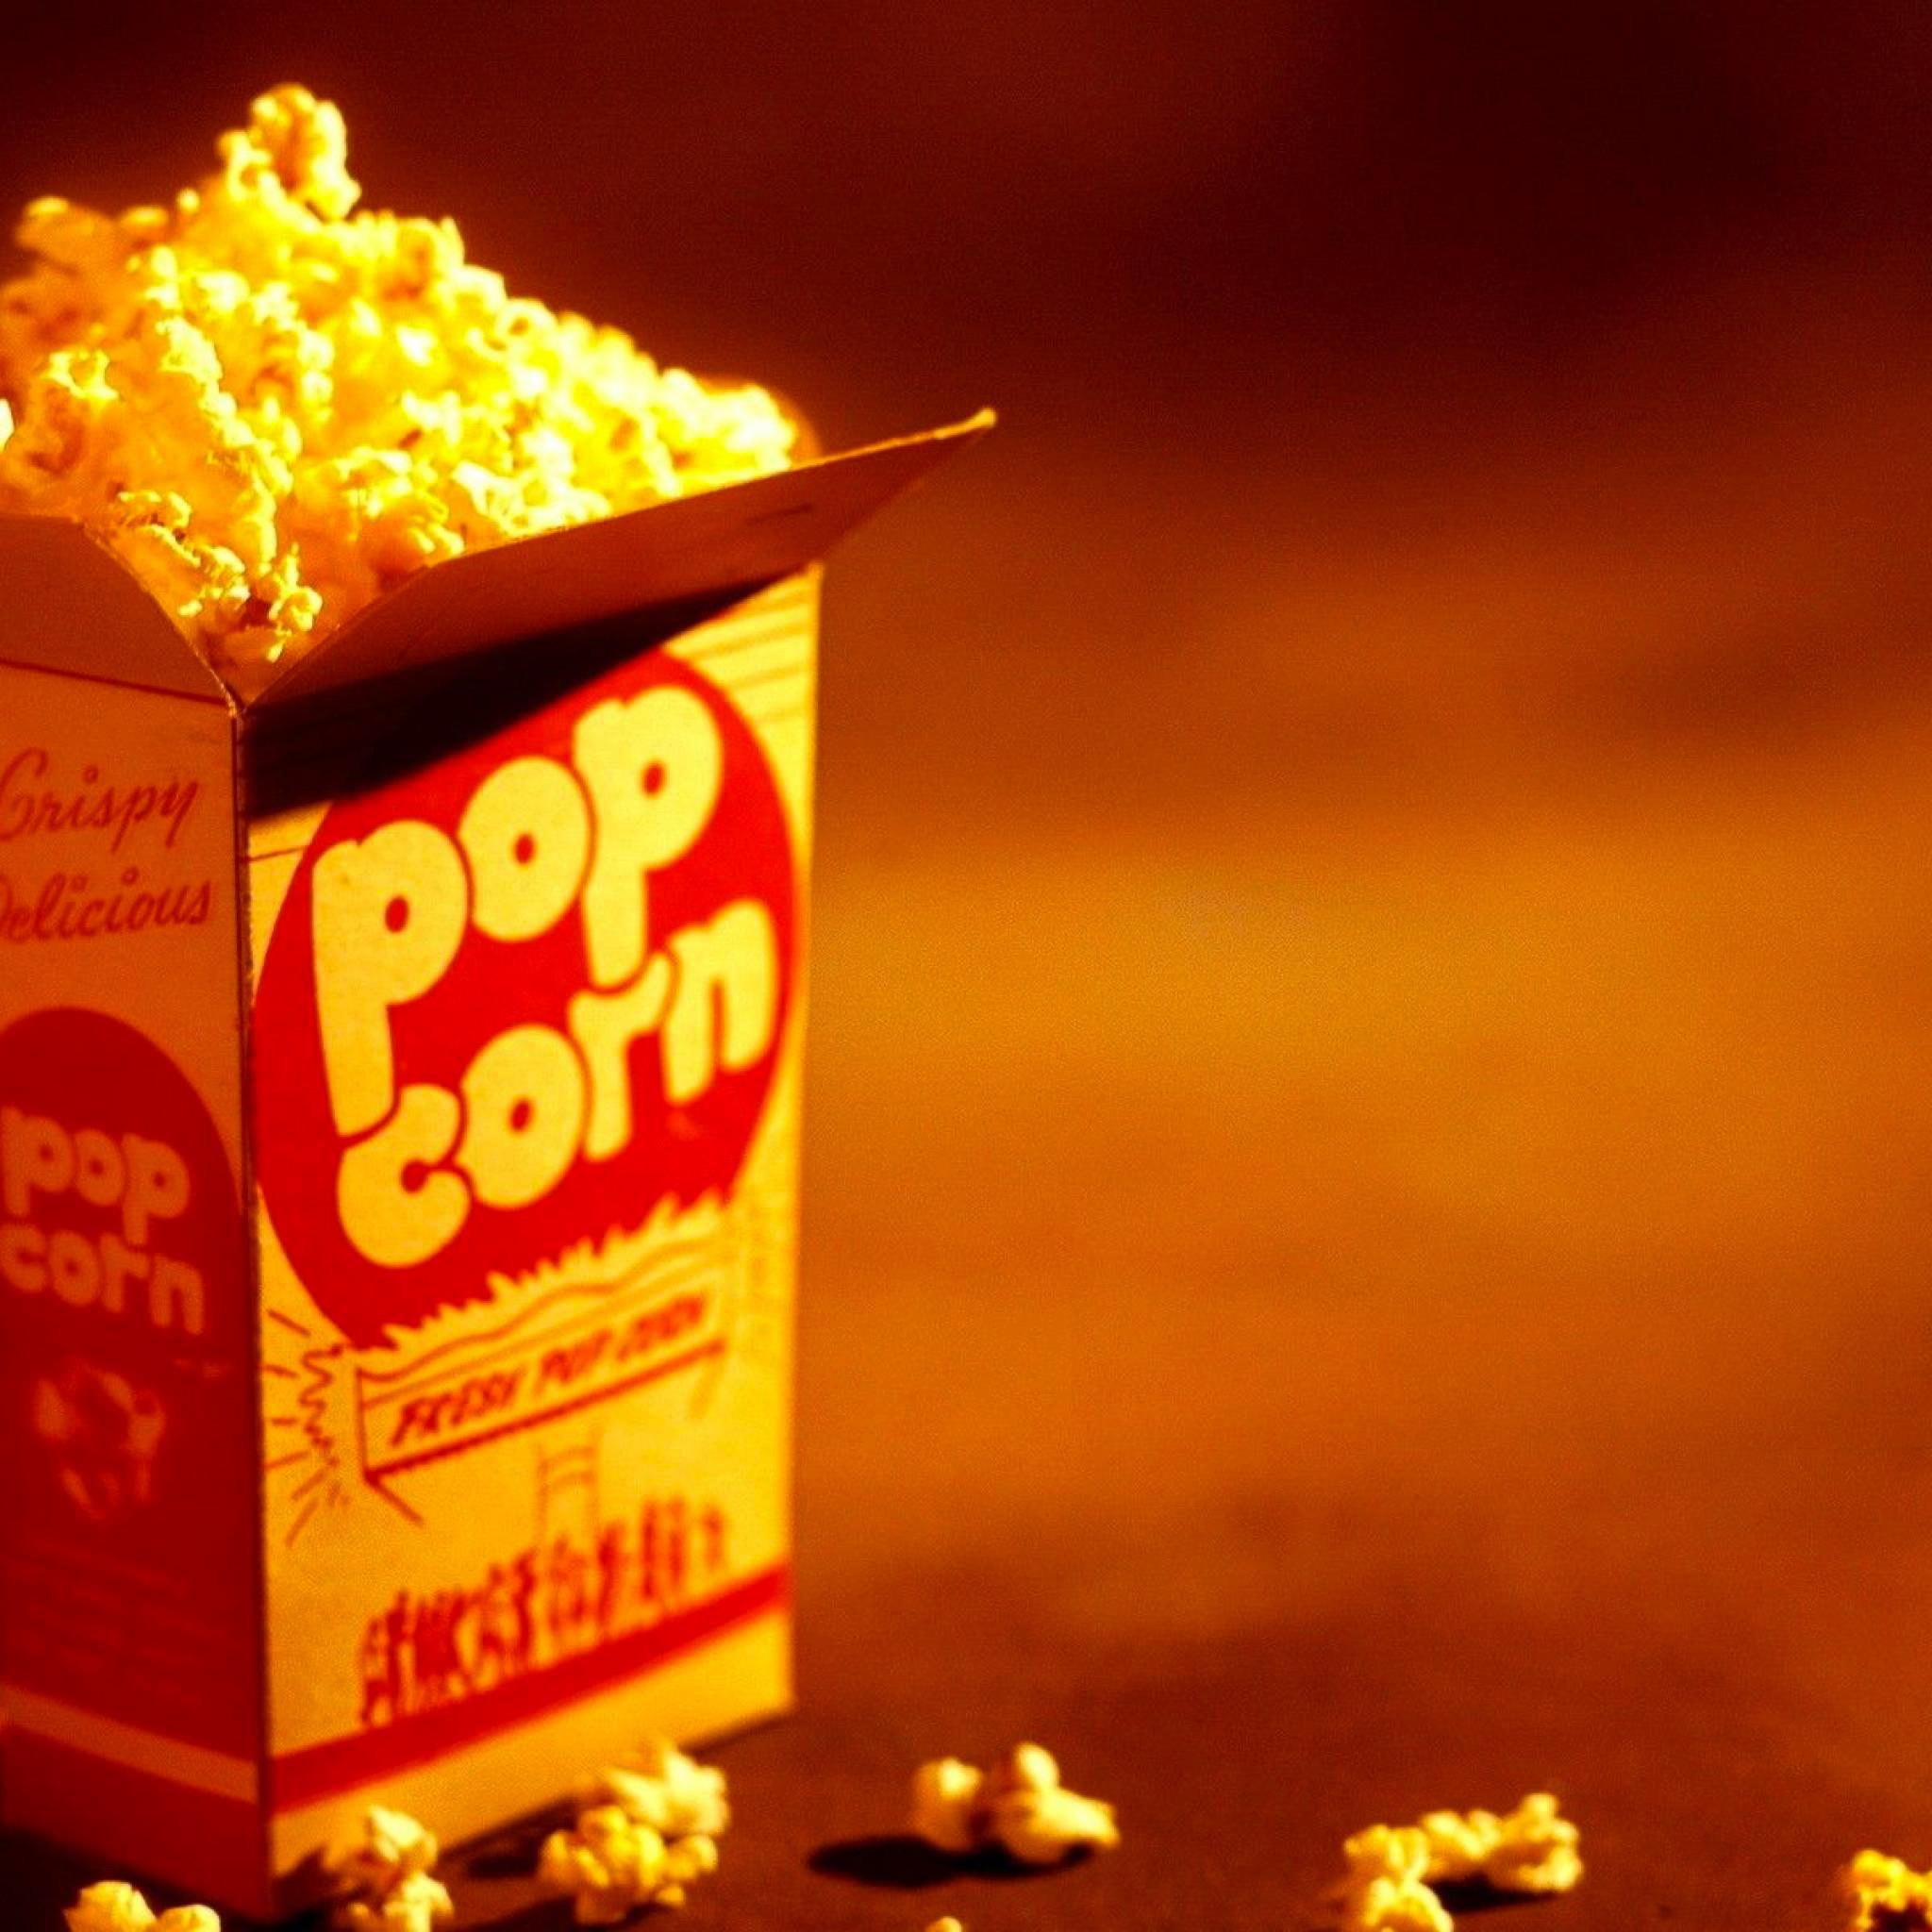 Pop-Corn-3Wallpapers-ipad-Retina